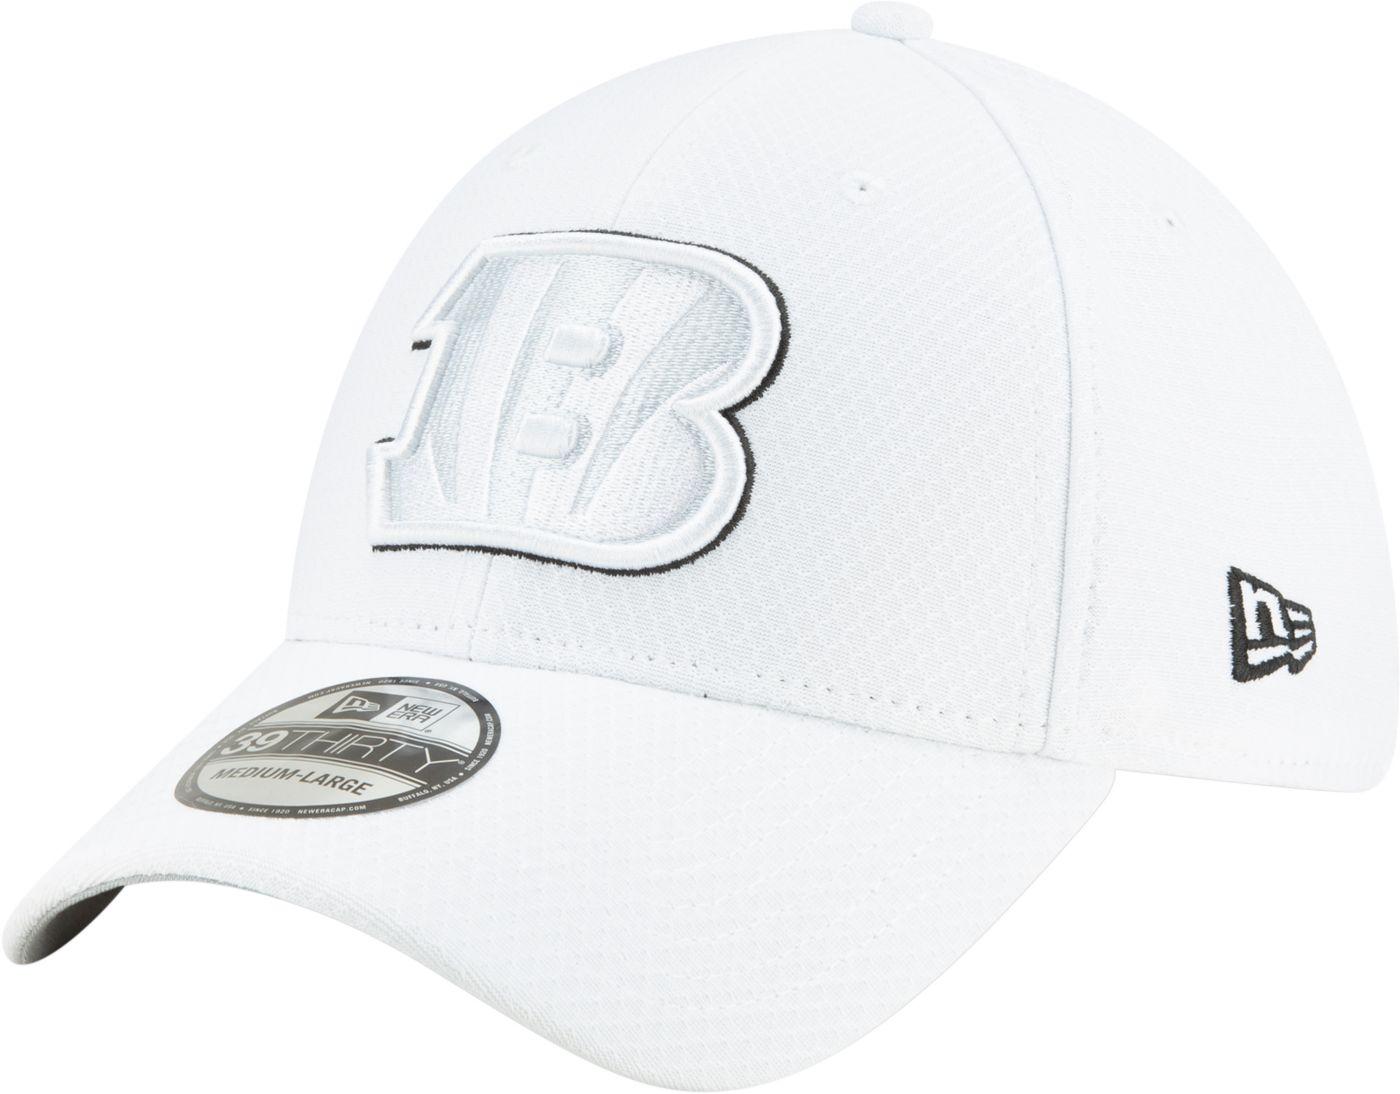 New Era Men's Cincinnati Bengals Sideline 100th 39Thirty Stretch Fit White Hat